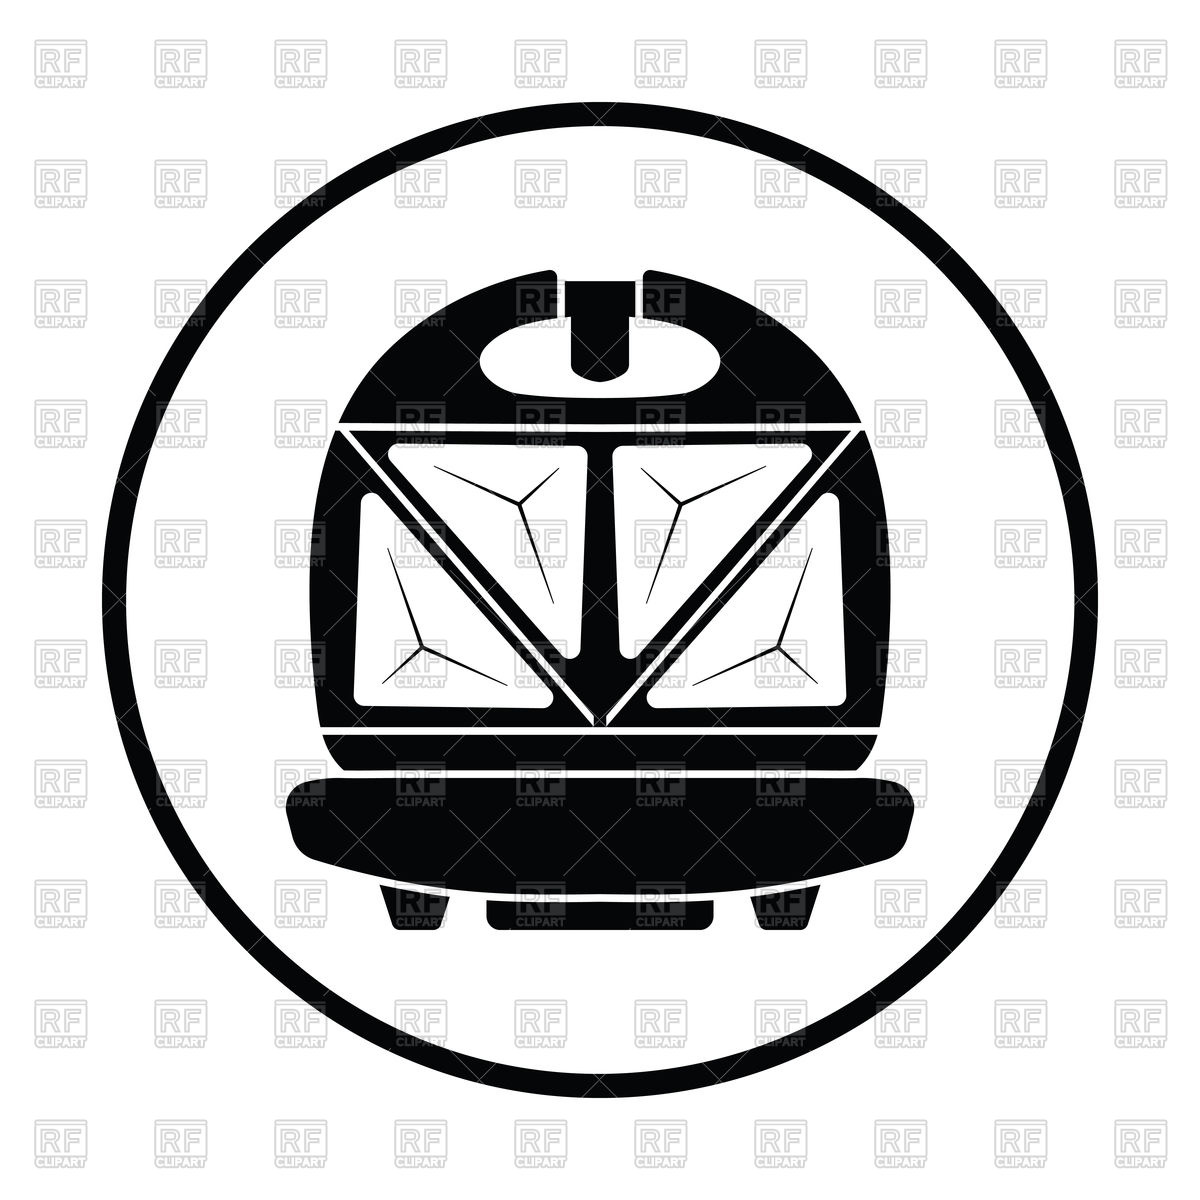 1200x1200 Thin Circle Design Of Kitchen Sandwich Maker Icon Vector Image